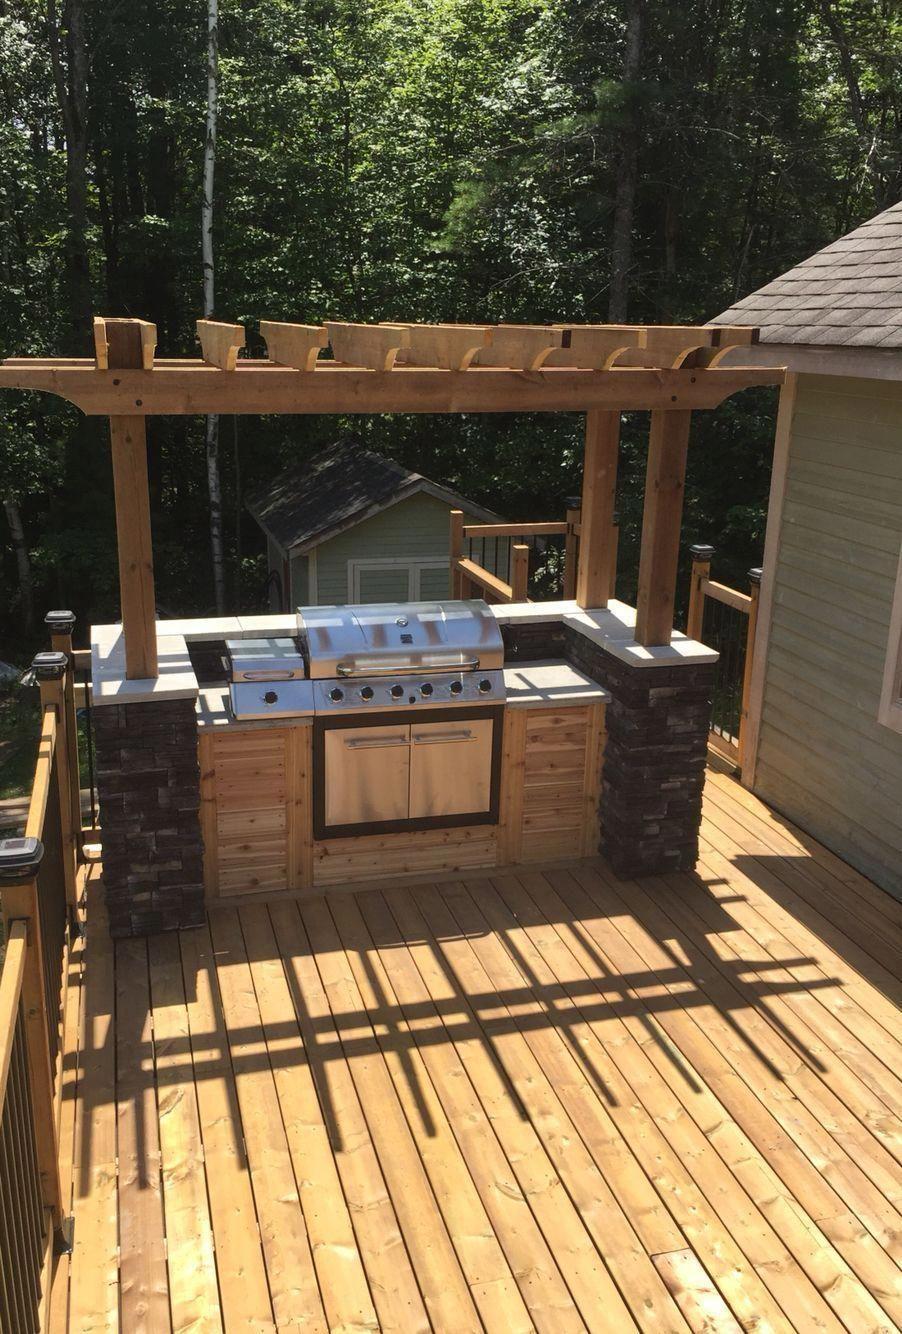 Diy outdoor kitchen kits  Outdoor Kitchen Design Ideas Pictures Tips u Expert Advice